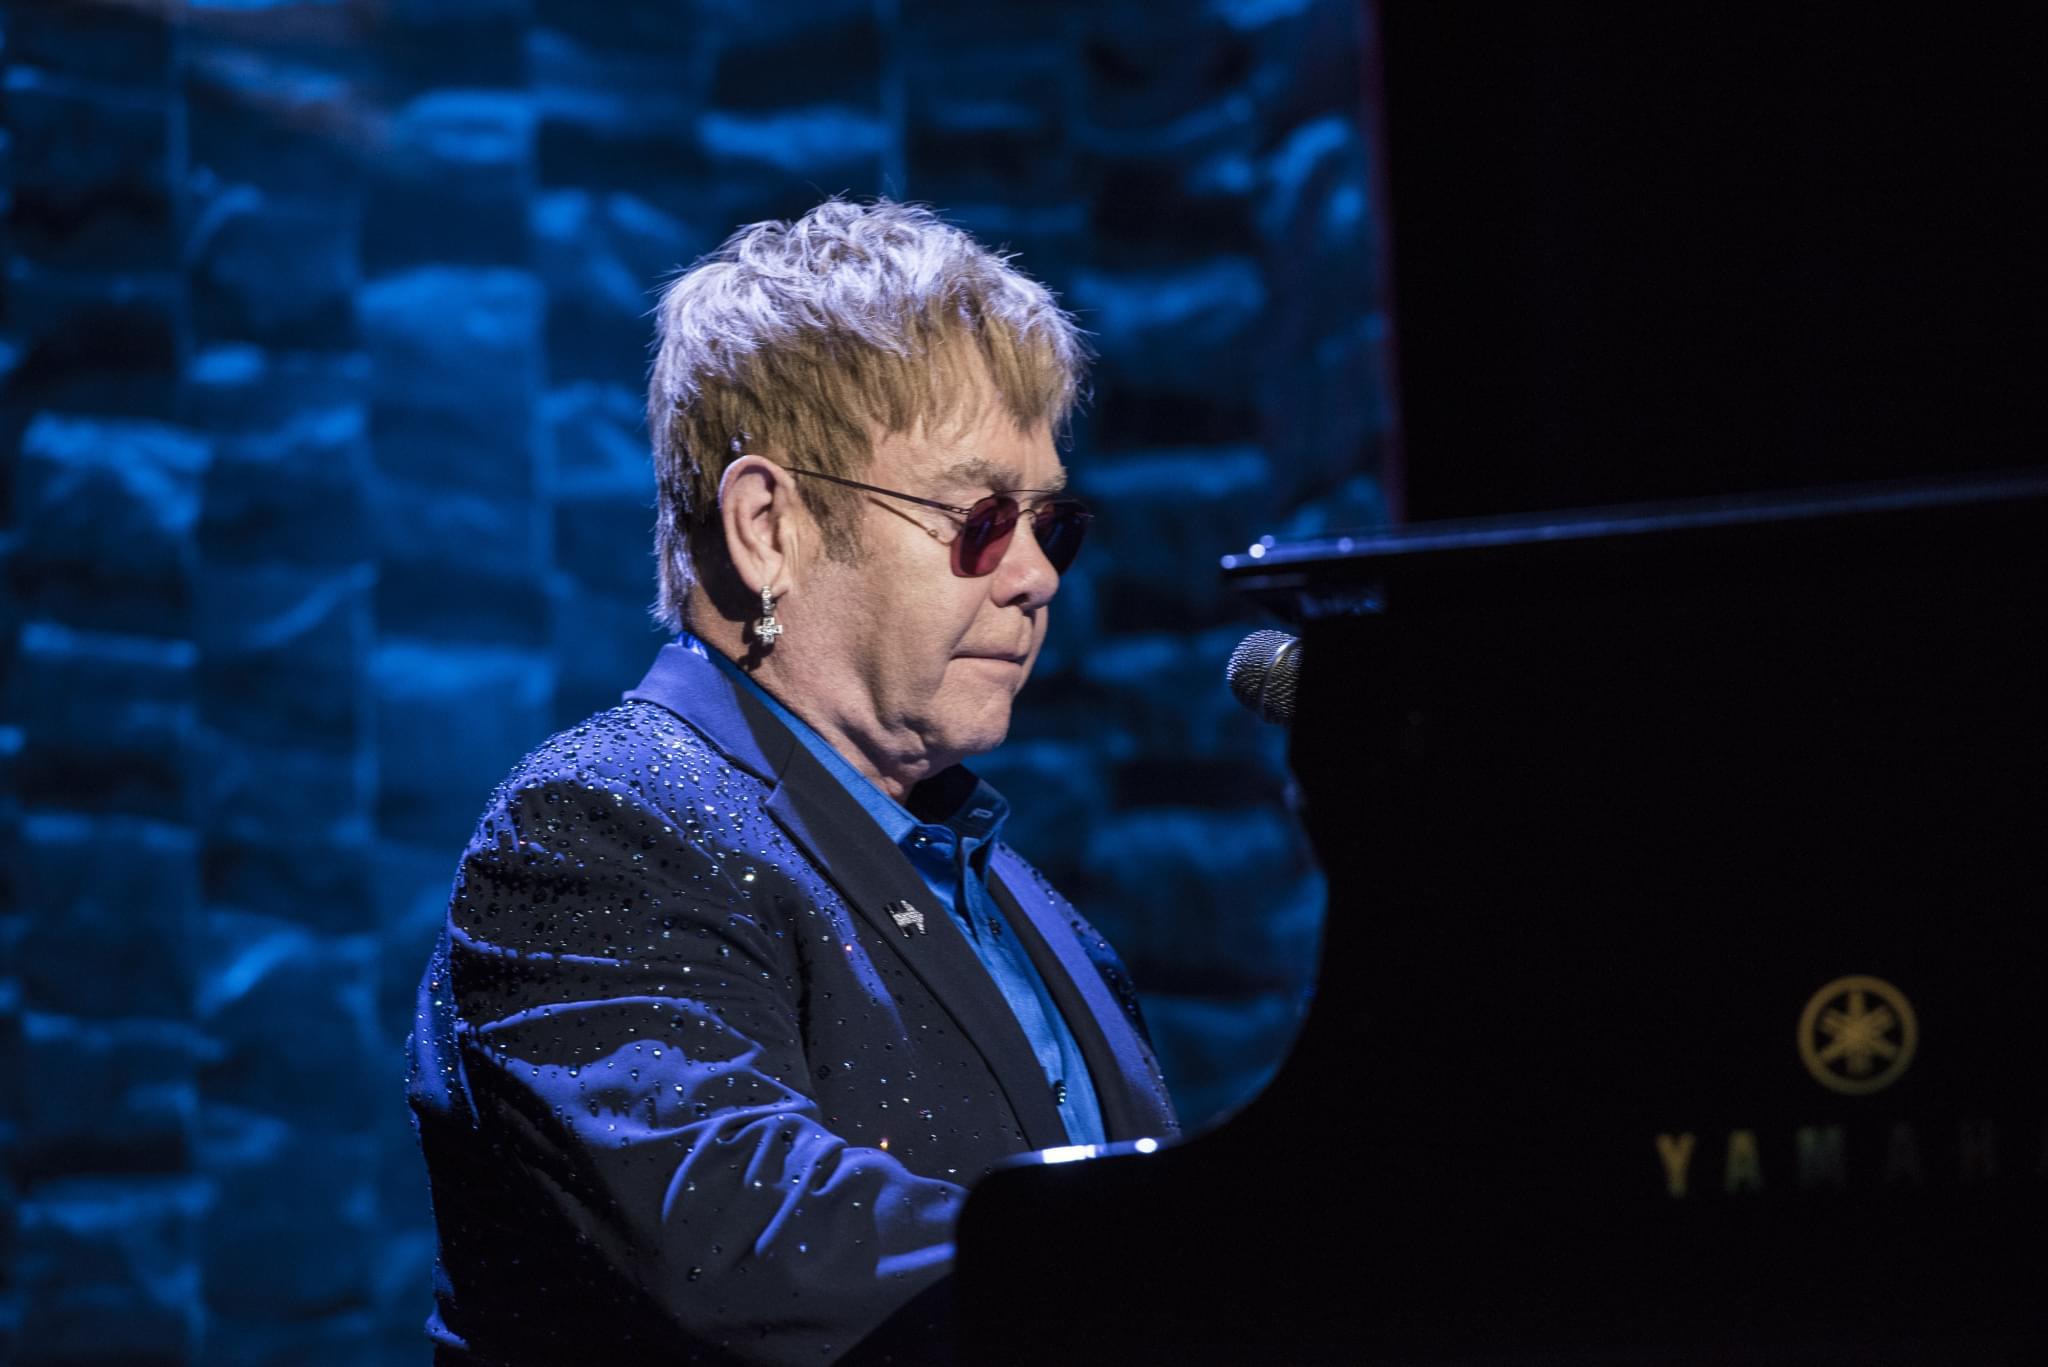 Elton John Biopic – Rocketman (2019) Official Trailer